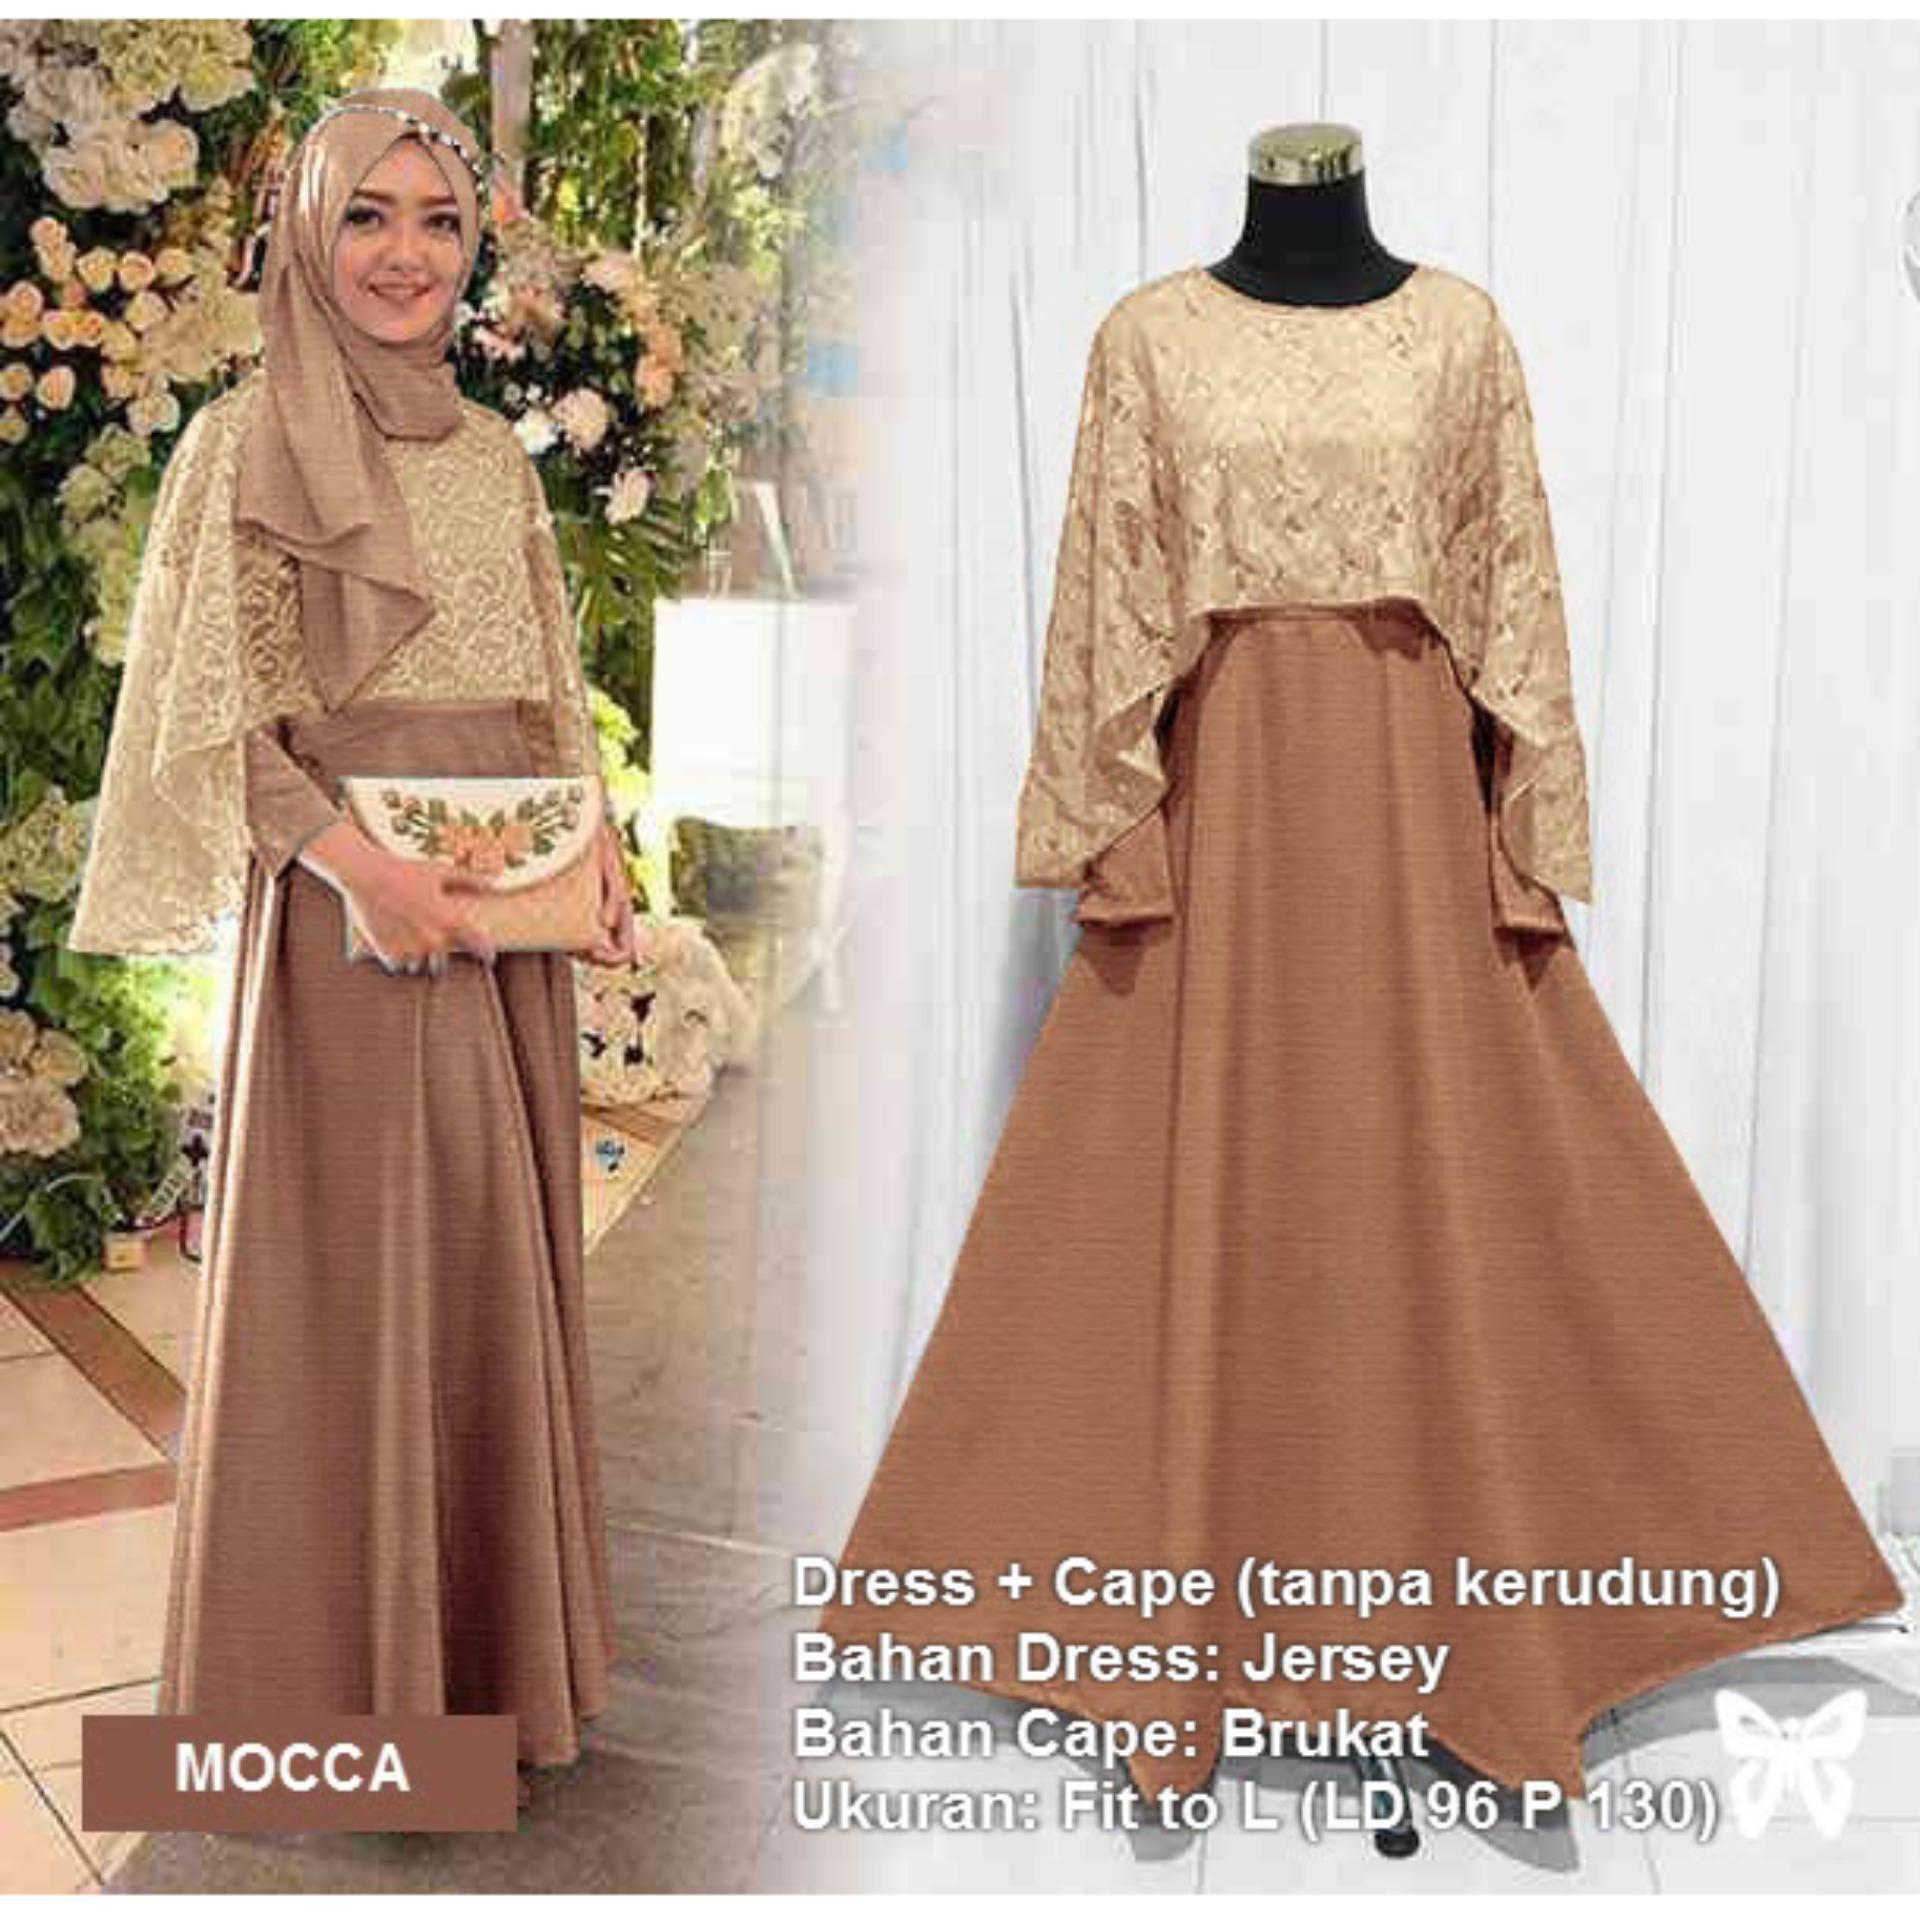 Maxi Dress Lengan Panjang Set 2 in 1 Cape Brukat MSR311 / Gamis Syari / Gaun Pesta Muslimah / Baju Muslim Wanita Syar'i / Hijab Kebaya Modern Brokat / Srtiara